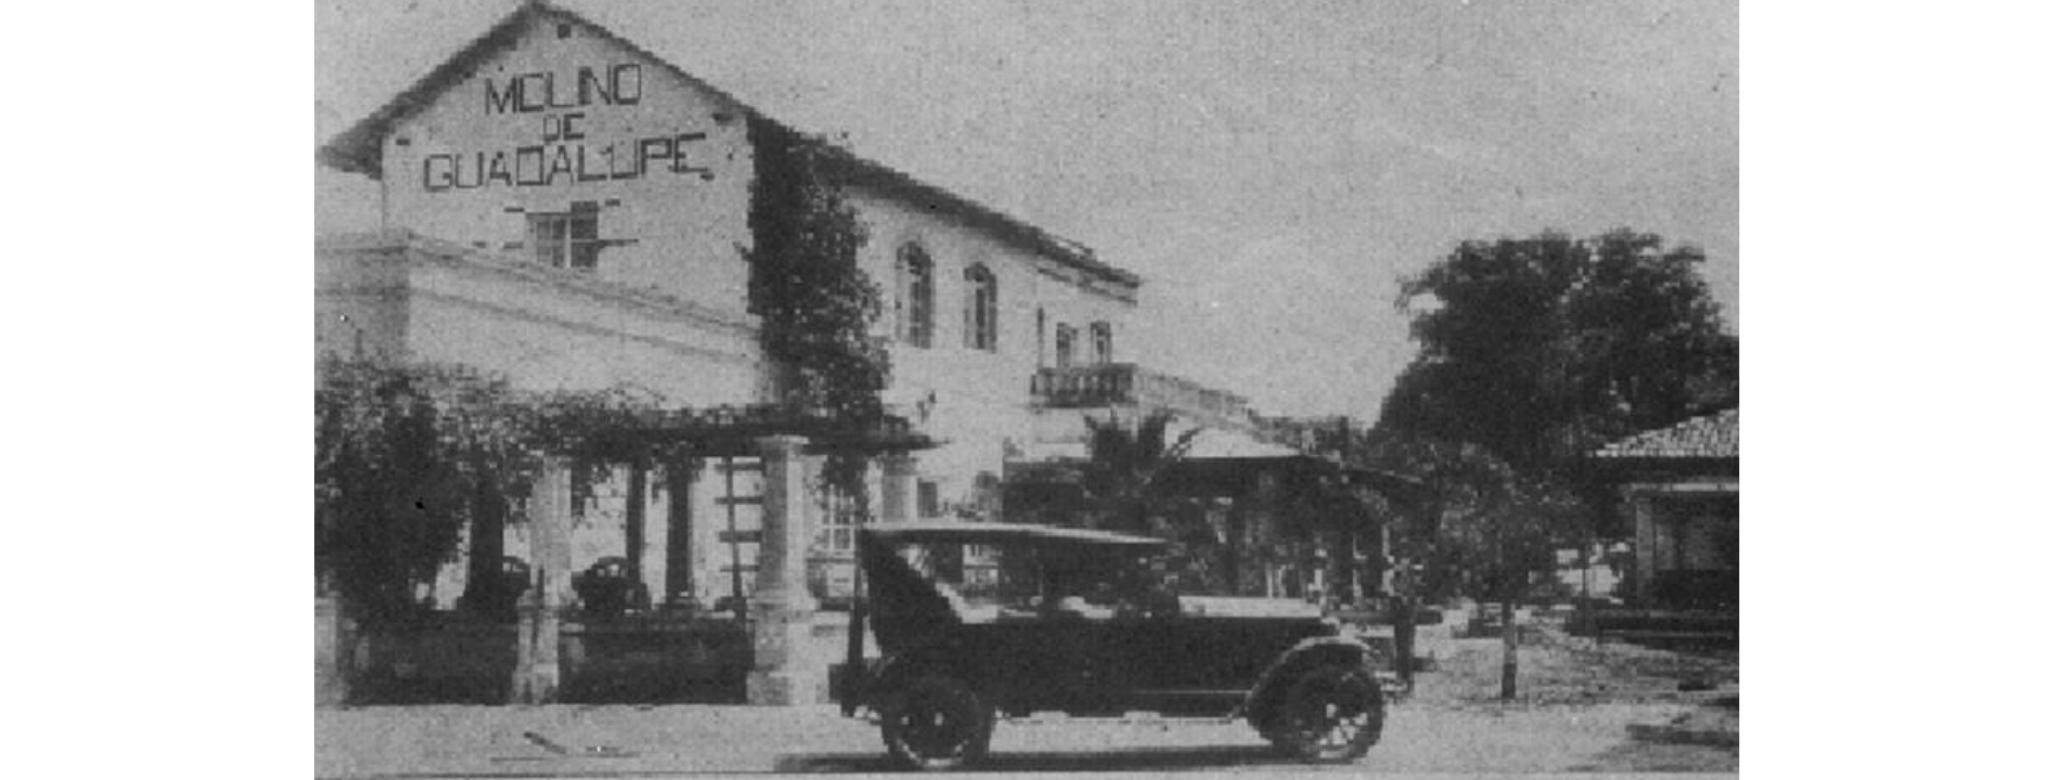 Harinas Guadalupe